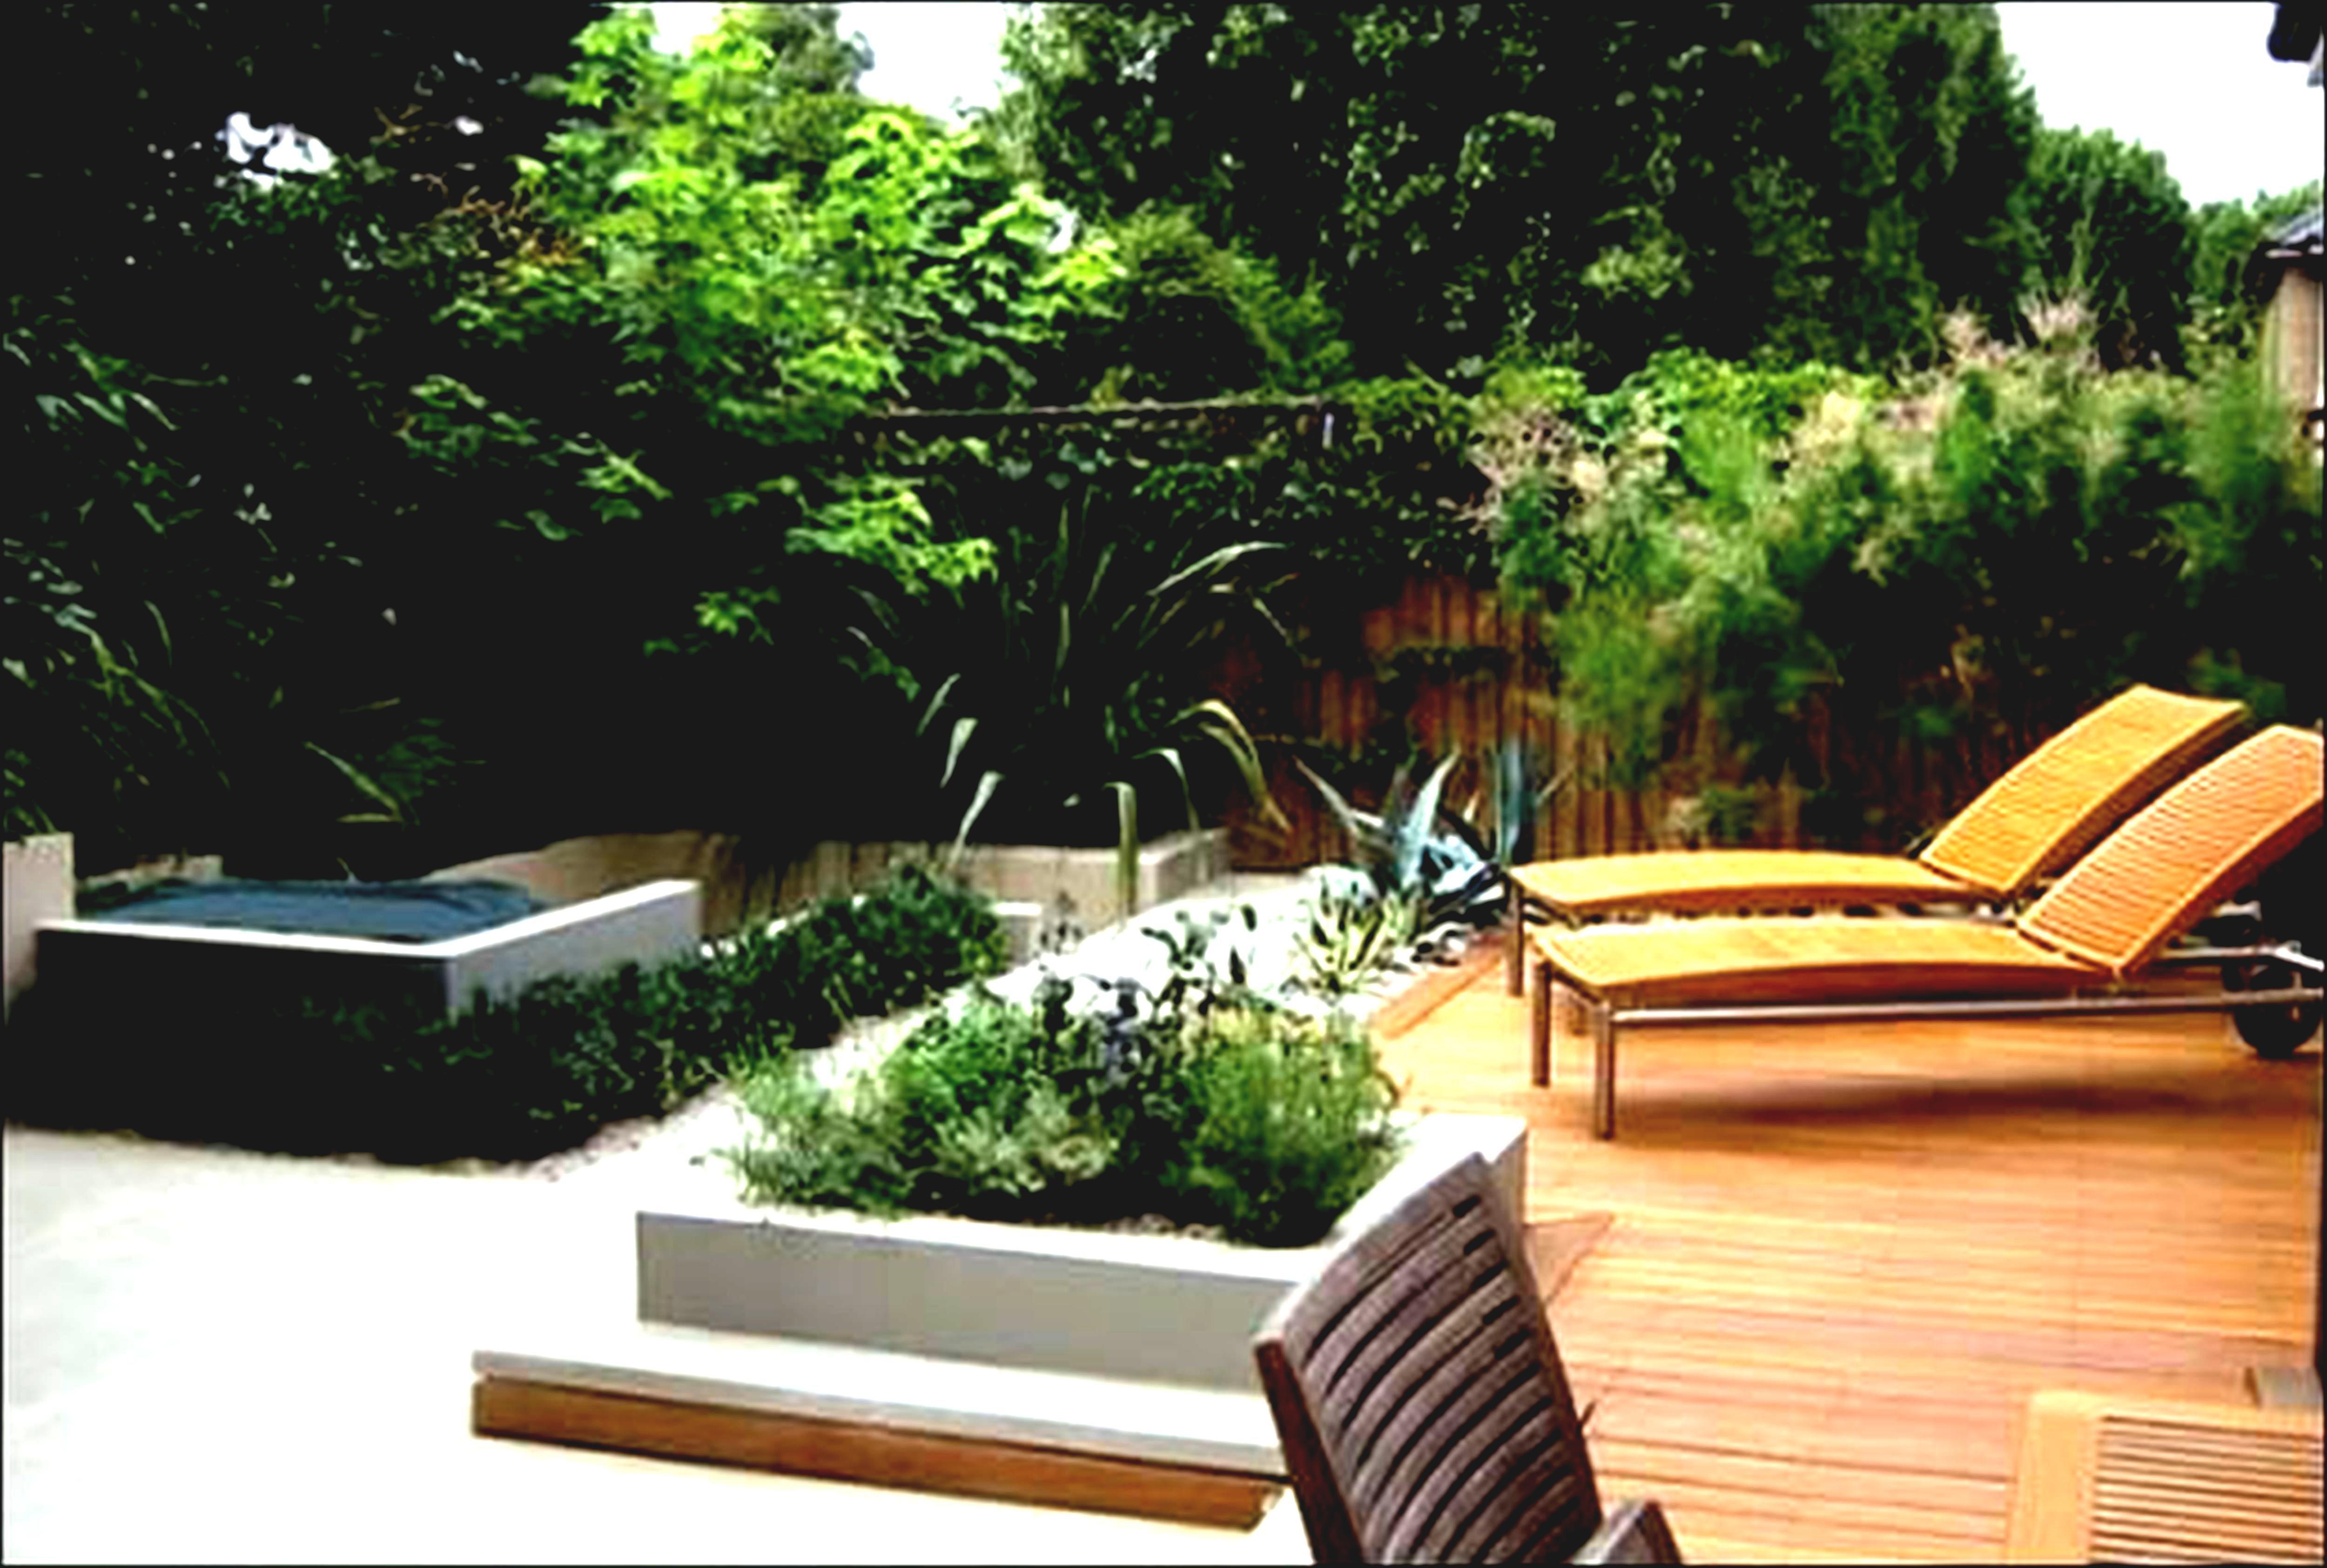 Erstaunlich Genial Garten Design Ideen Bilder #Gartendeko